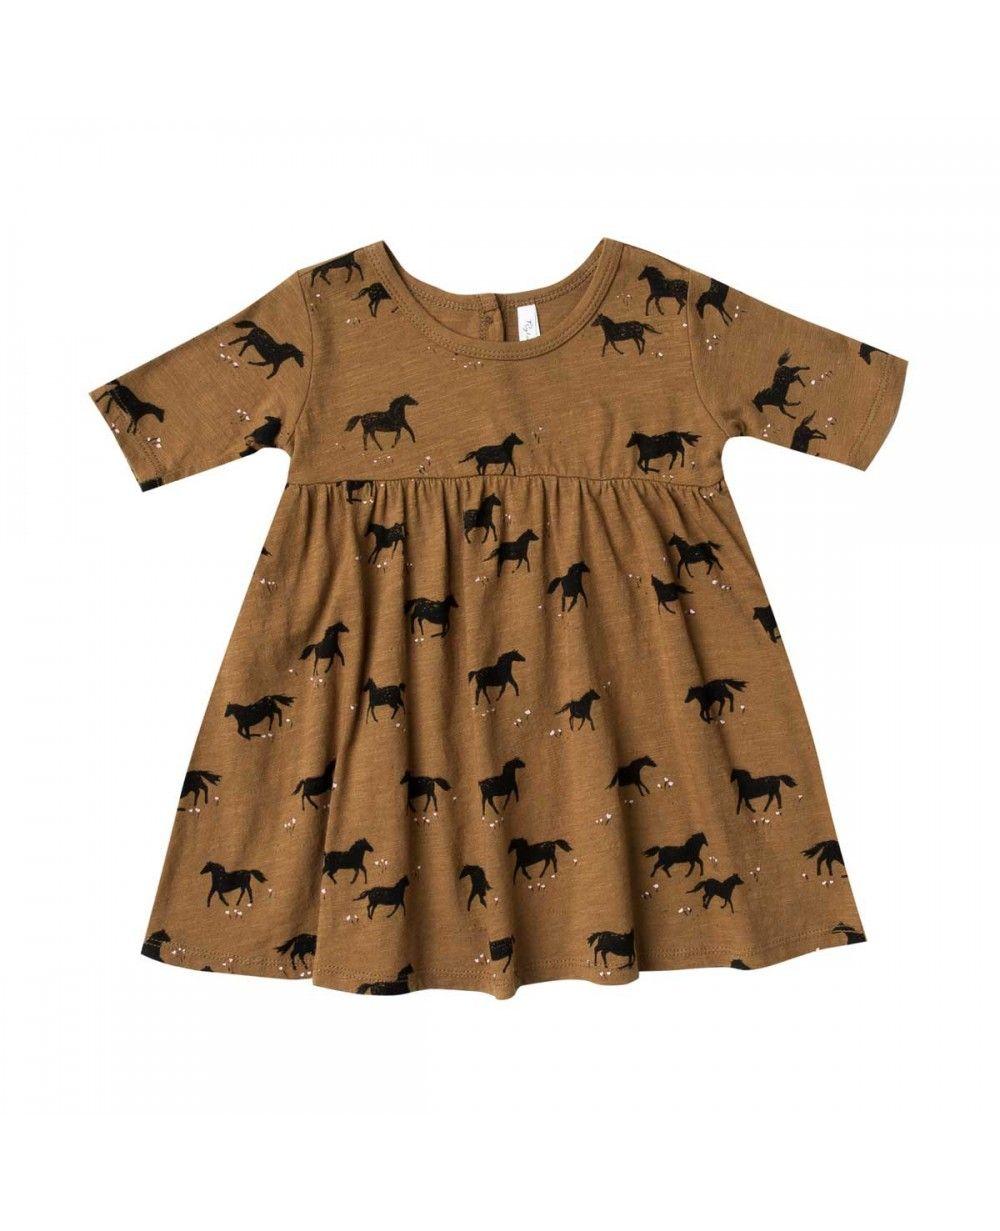 df28686f58b300 Horses Finn Baby Dress - Rylee + Cru Online - Baby